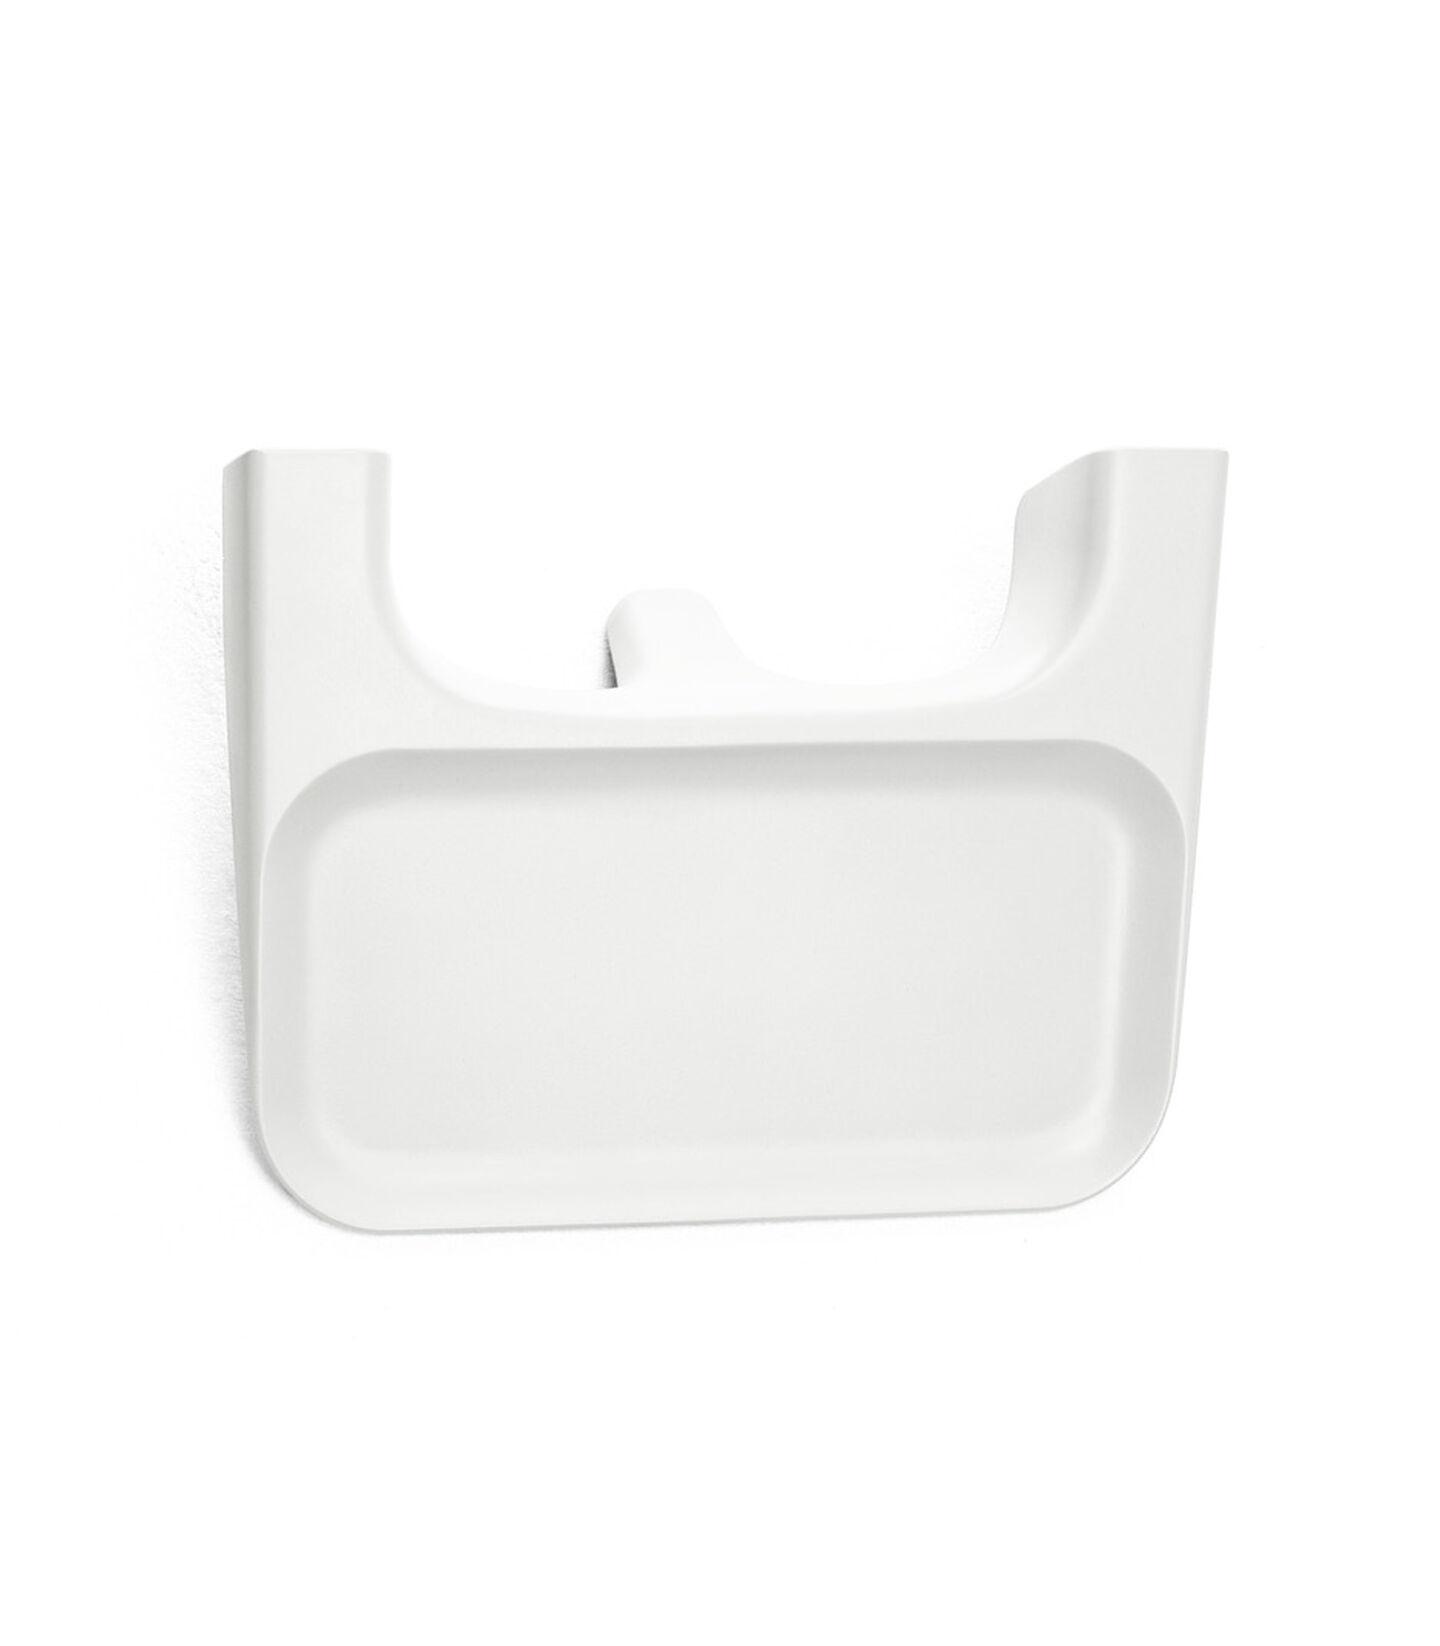 Plateau Stokke® Clikk™ Blanc, Blanc, mainview view 2